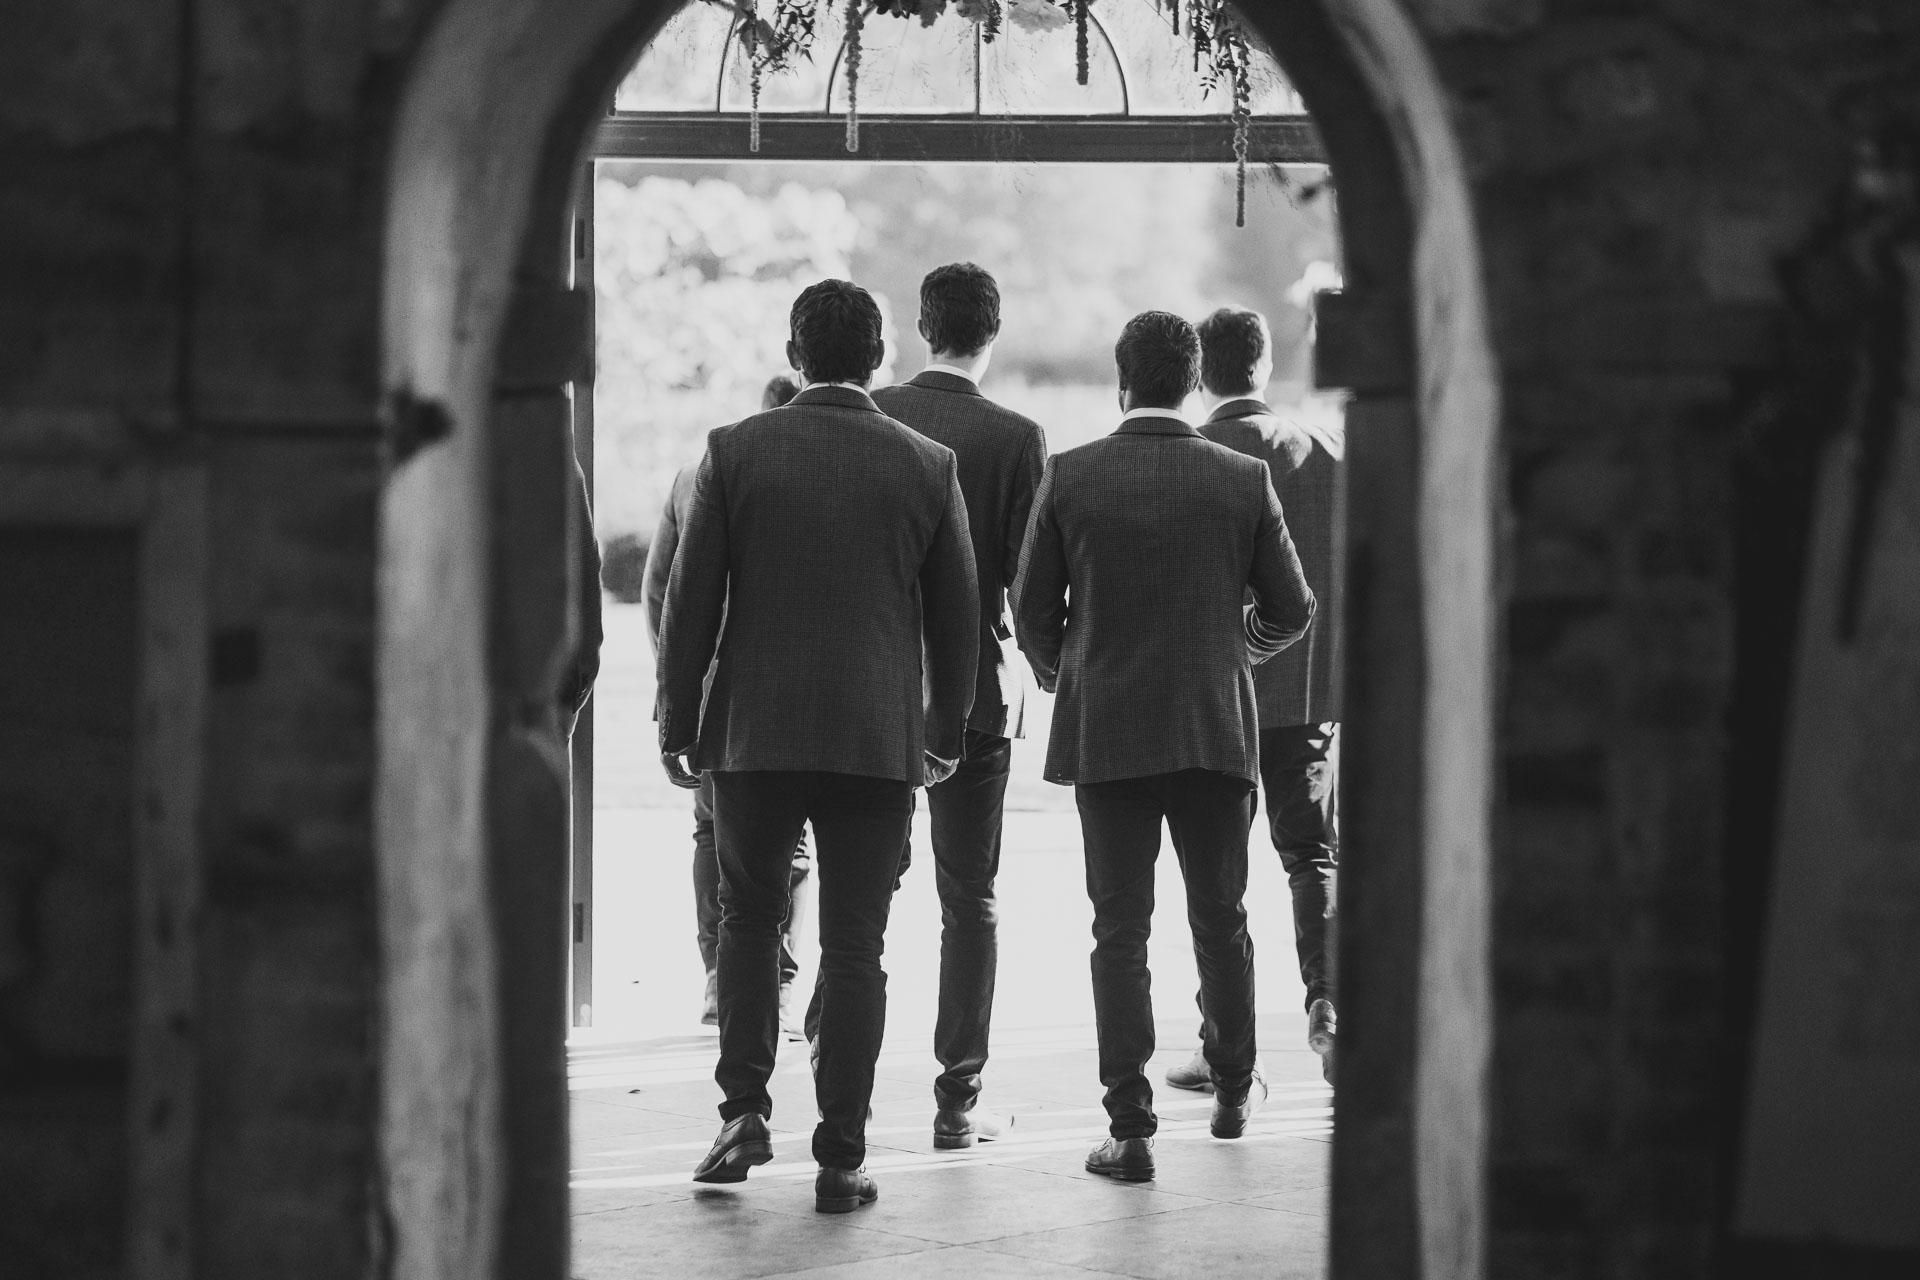 middleton_lodge_wedding_photographer-47.jpg